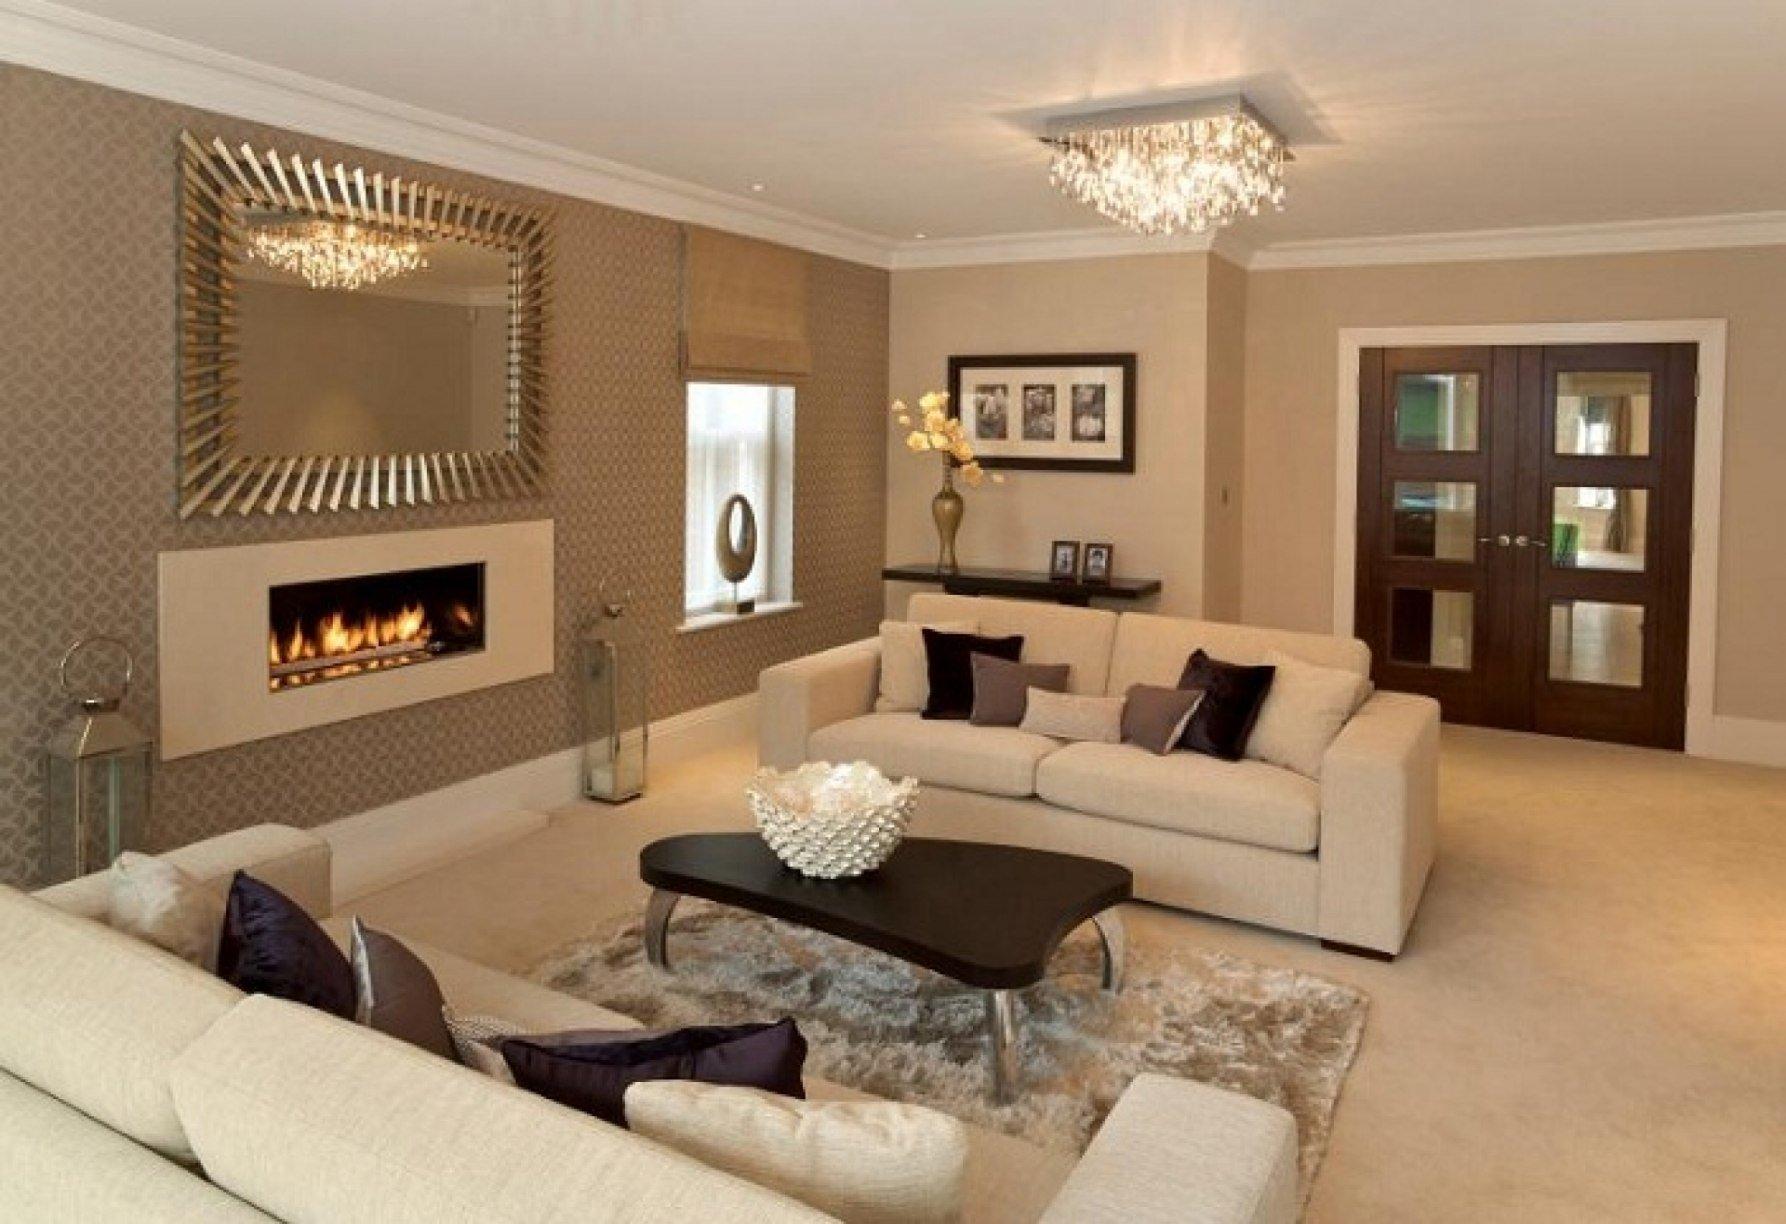 10 Lovable Leather Sofa Living Room Ideas furniture cream leather sofa living room ideas cream leather sofa 2021